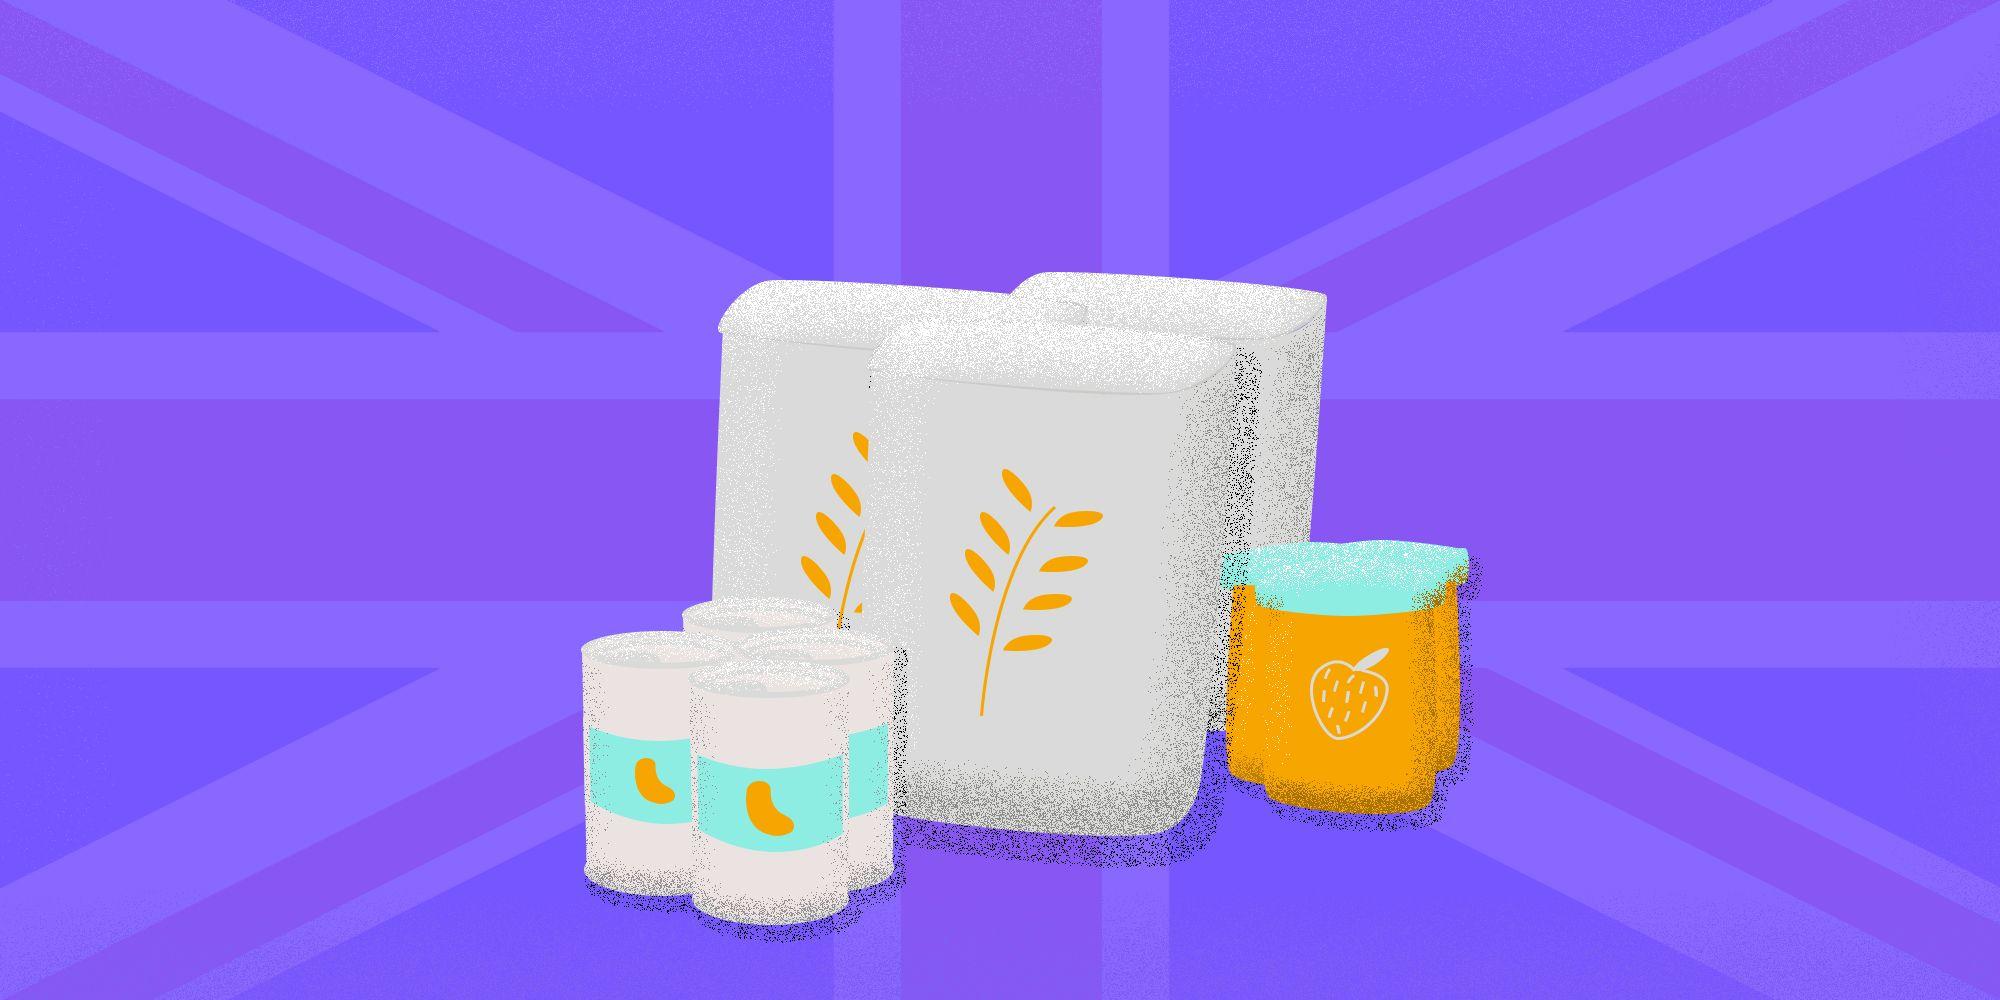 Stockpiling food - Brexitno deal